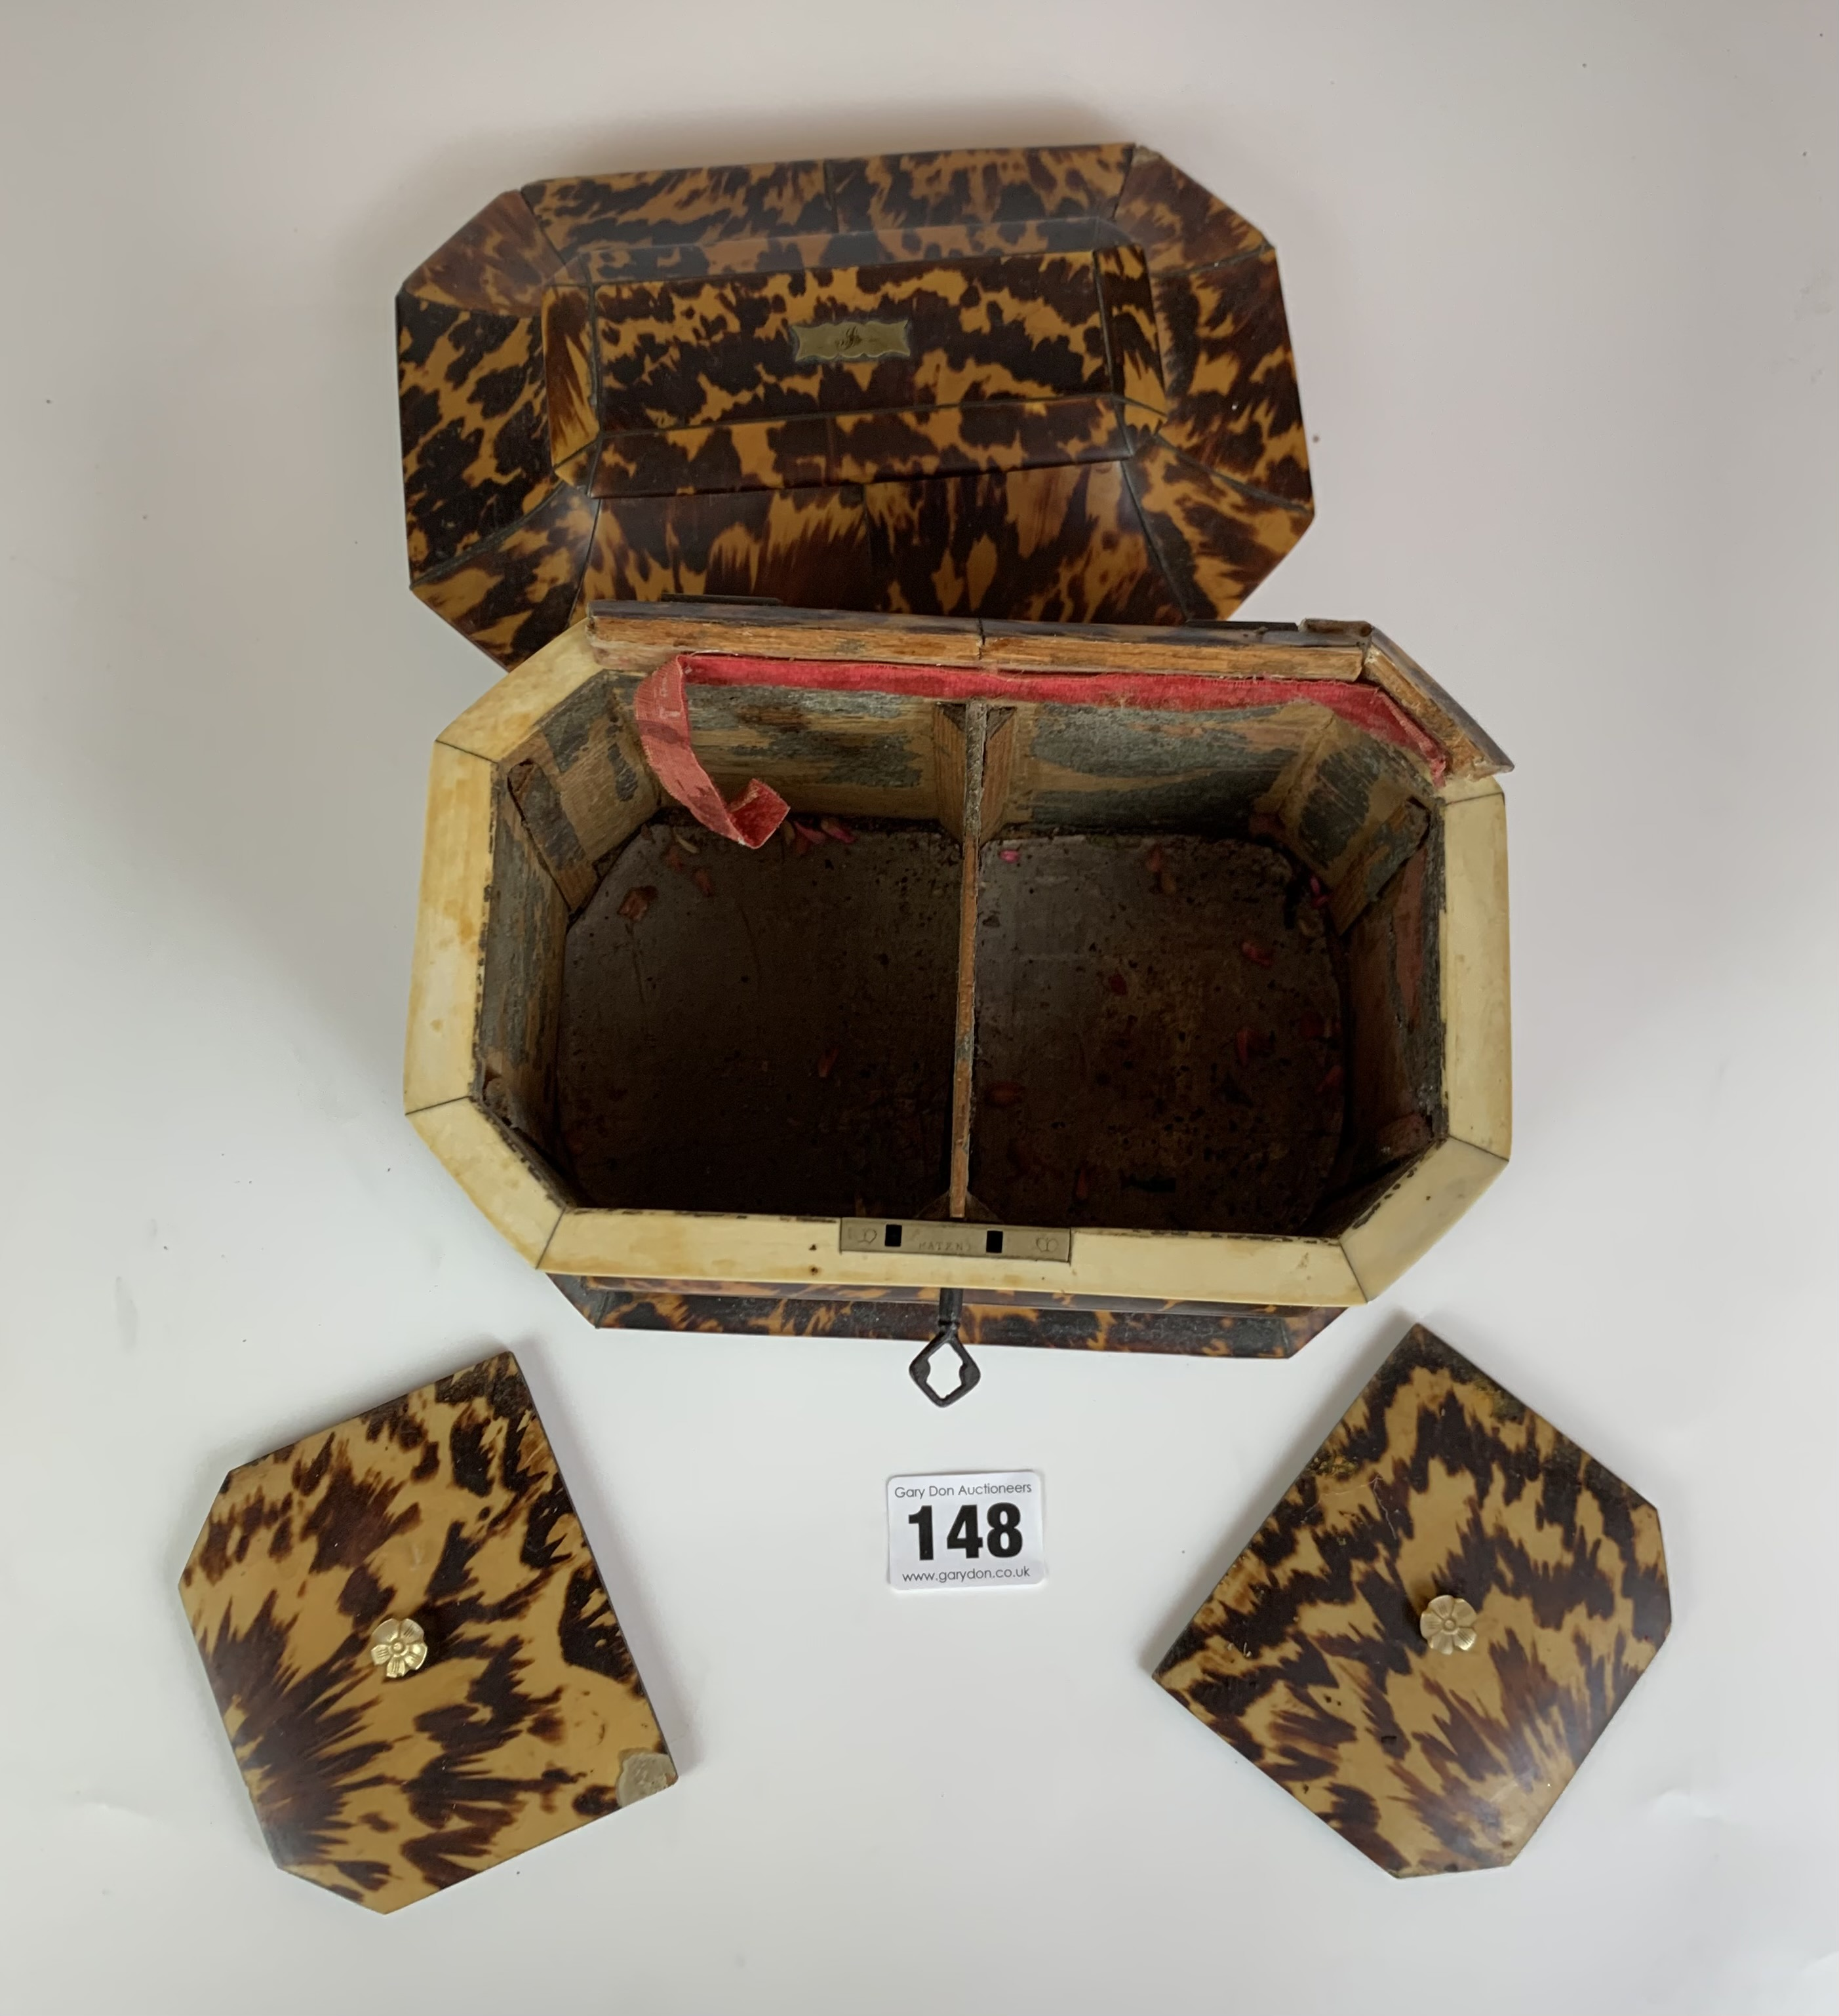 "Regency Tortoiseshell veneered tea caddy with twin compartment, c. 1820. Lid damaged. 7.5"" long x 5"" - Image 5 of 5"